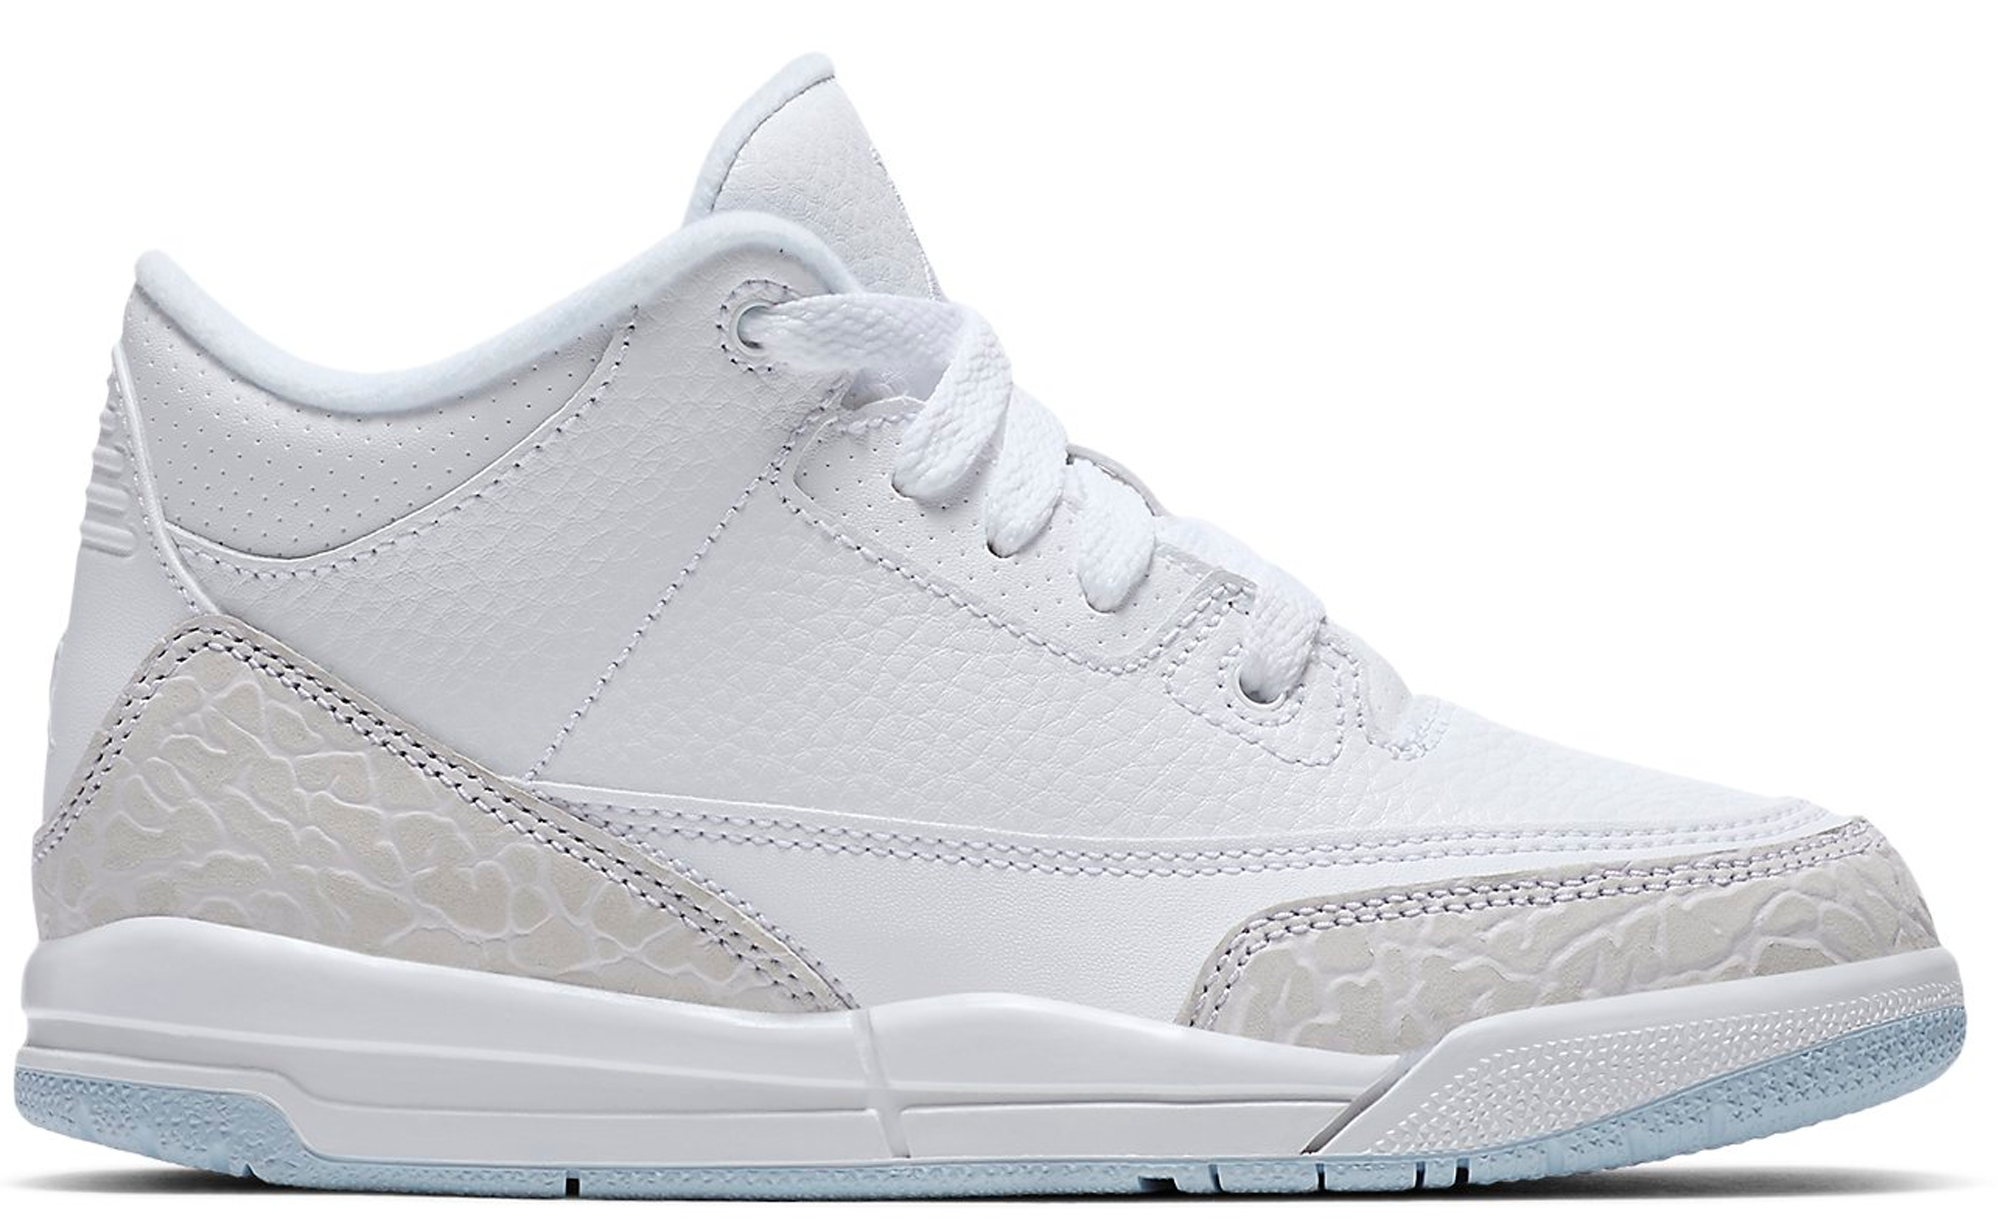 Jordan 3 Retro Pure White 2018 (PS